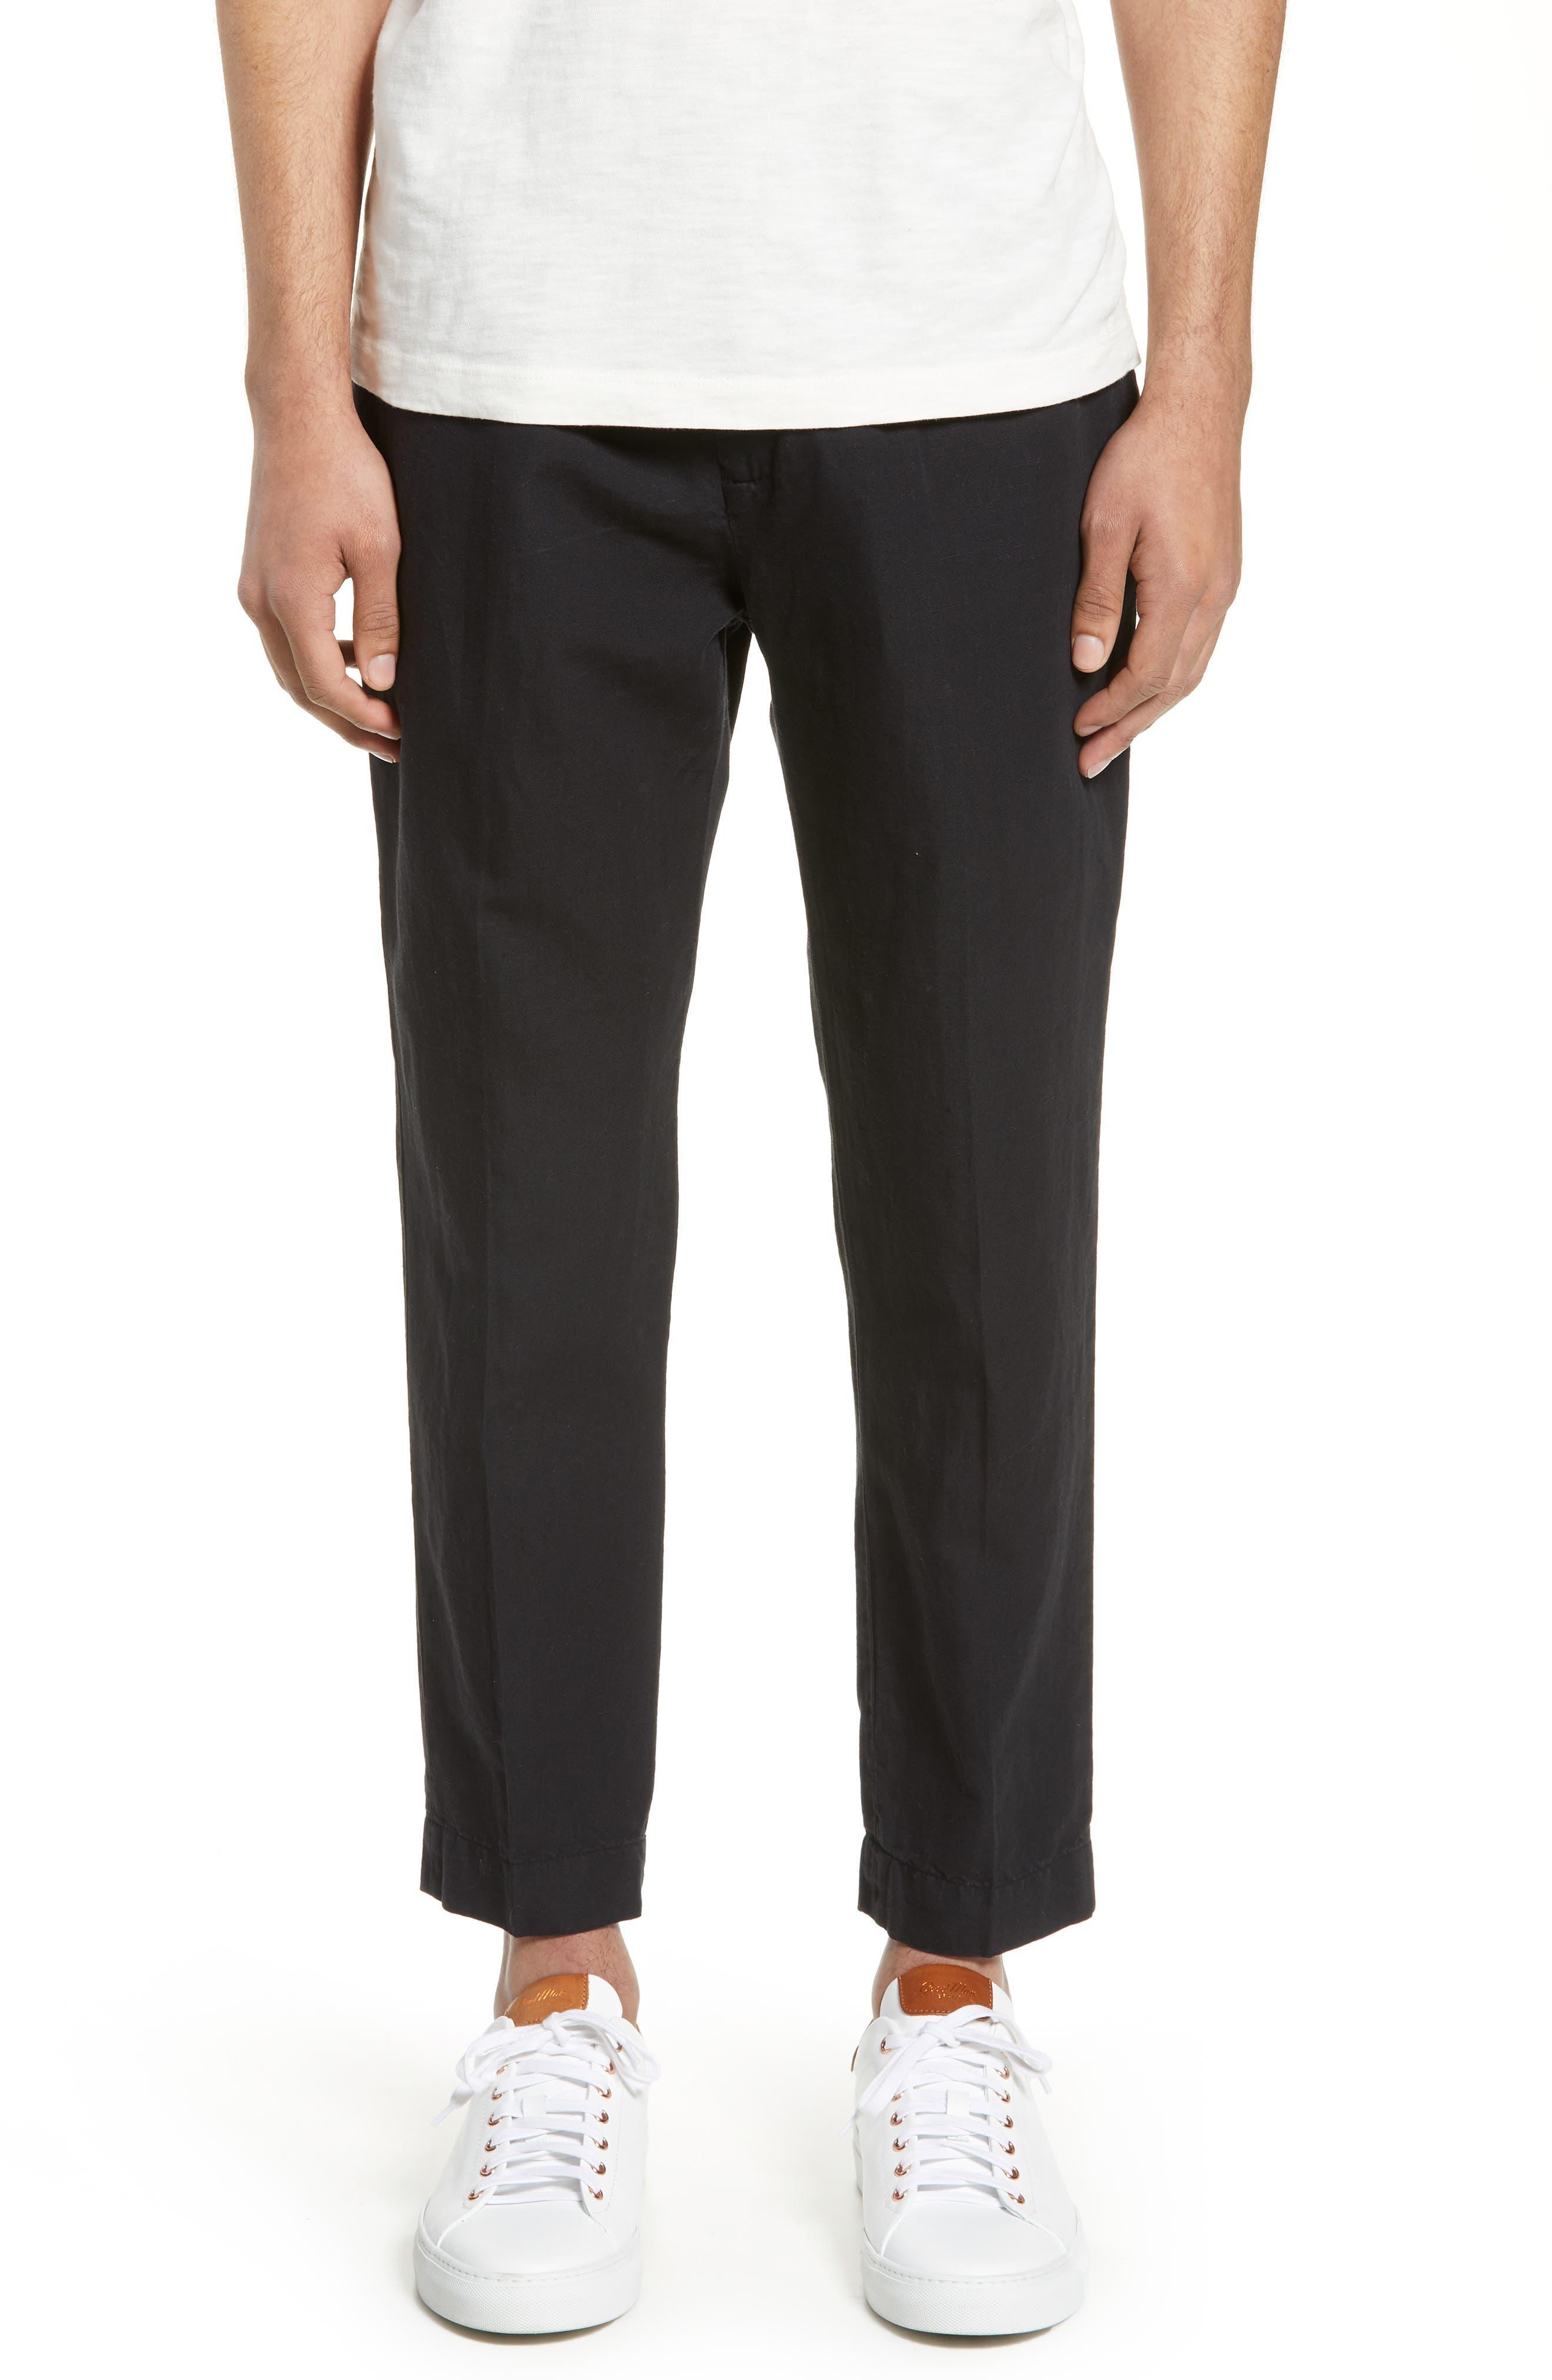 28668cd0c Mens Slim Cropped Dress Pants | Saddha